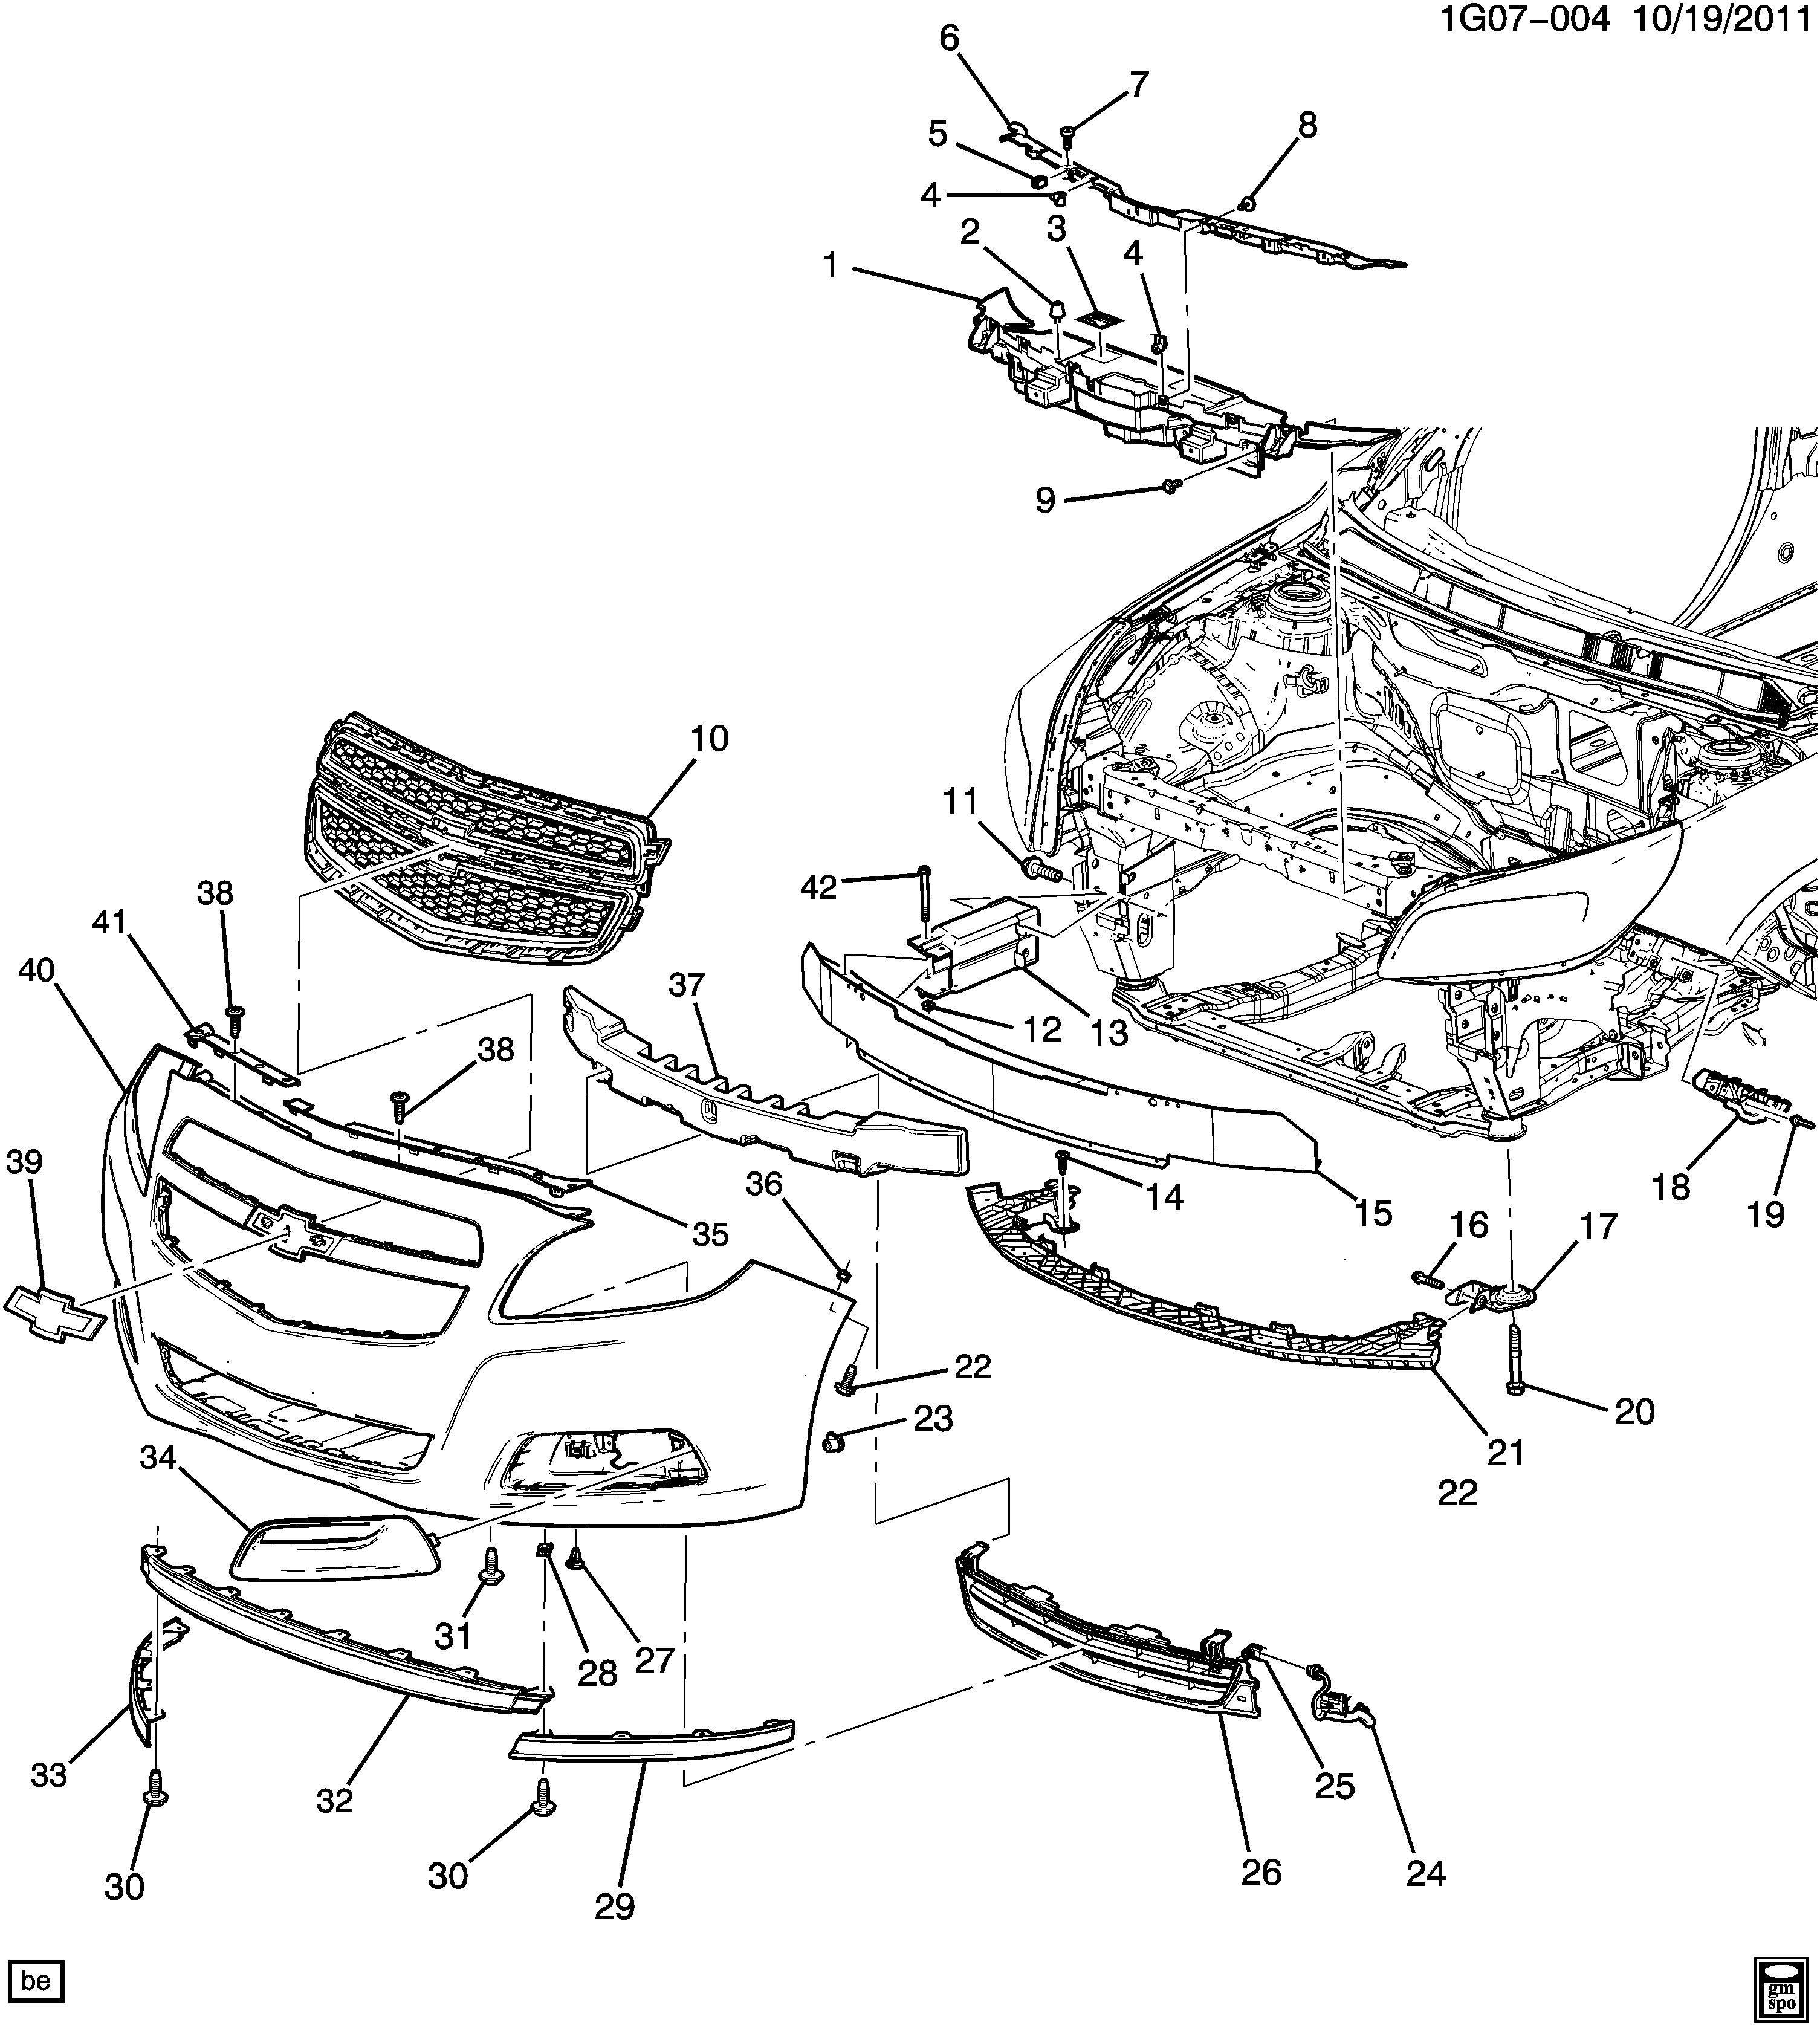 Chevrolet Malibu Wiring Diagrams